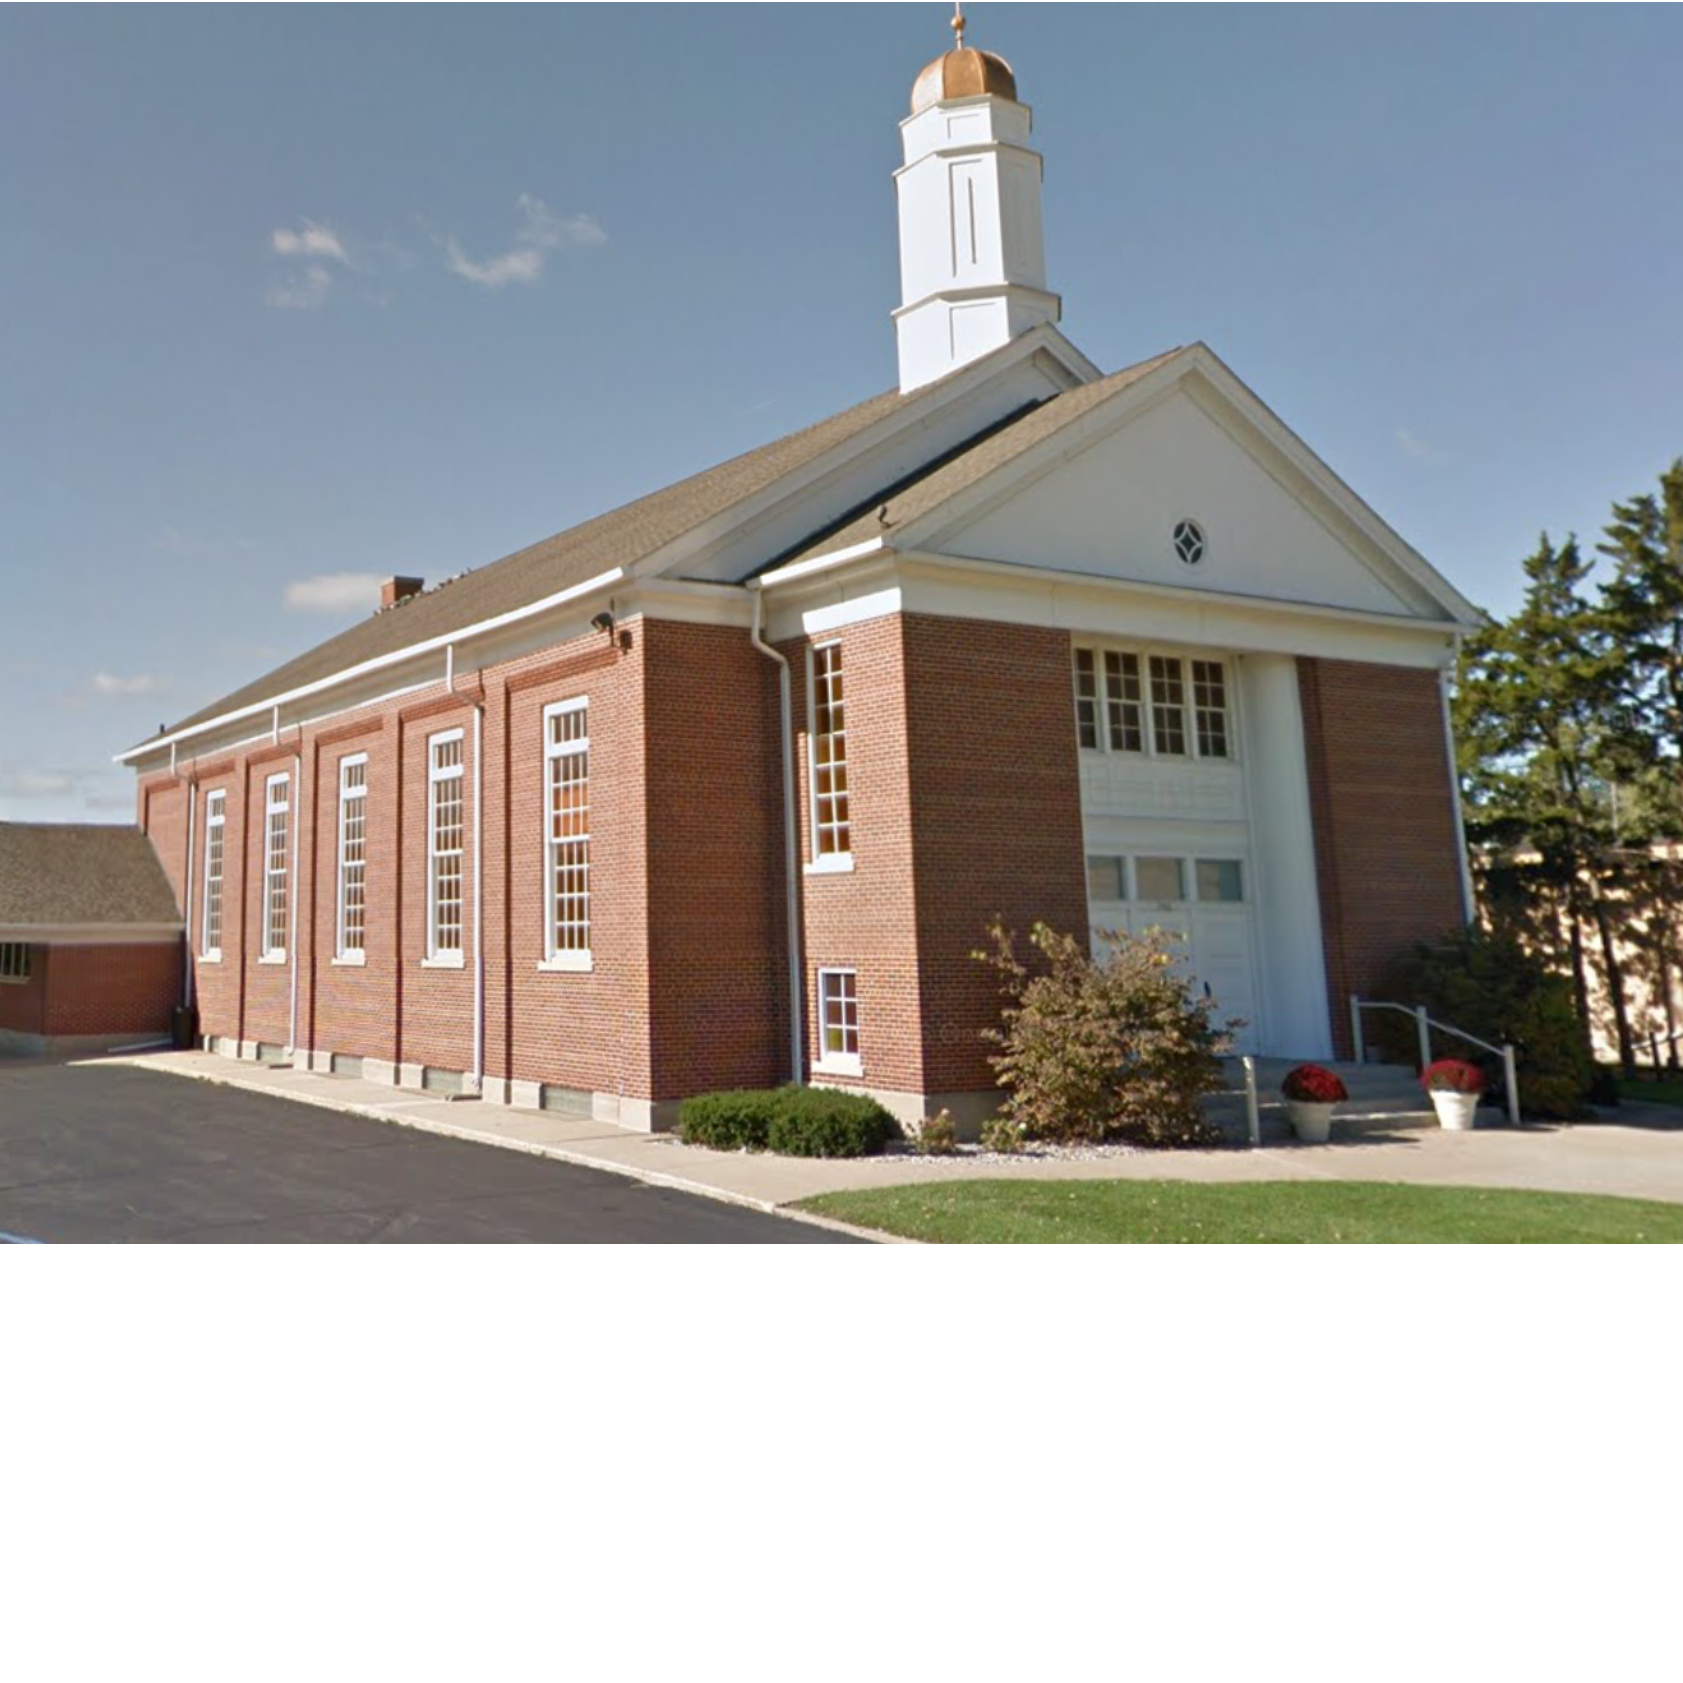 Iglesia Cristiana en Kalamazoo CASA DE ORACION image 5